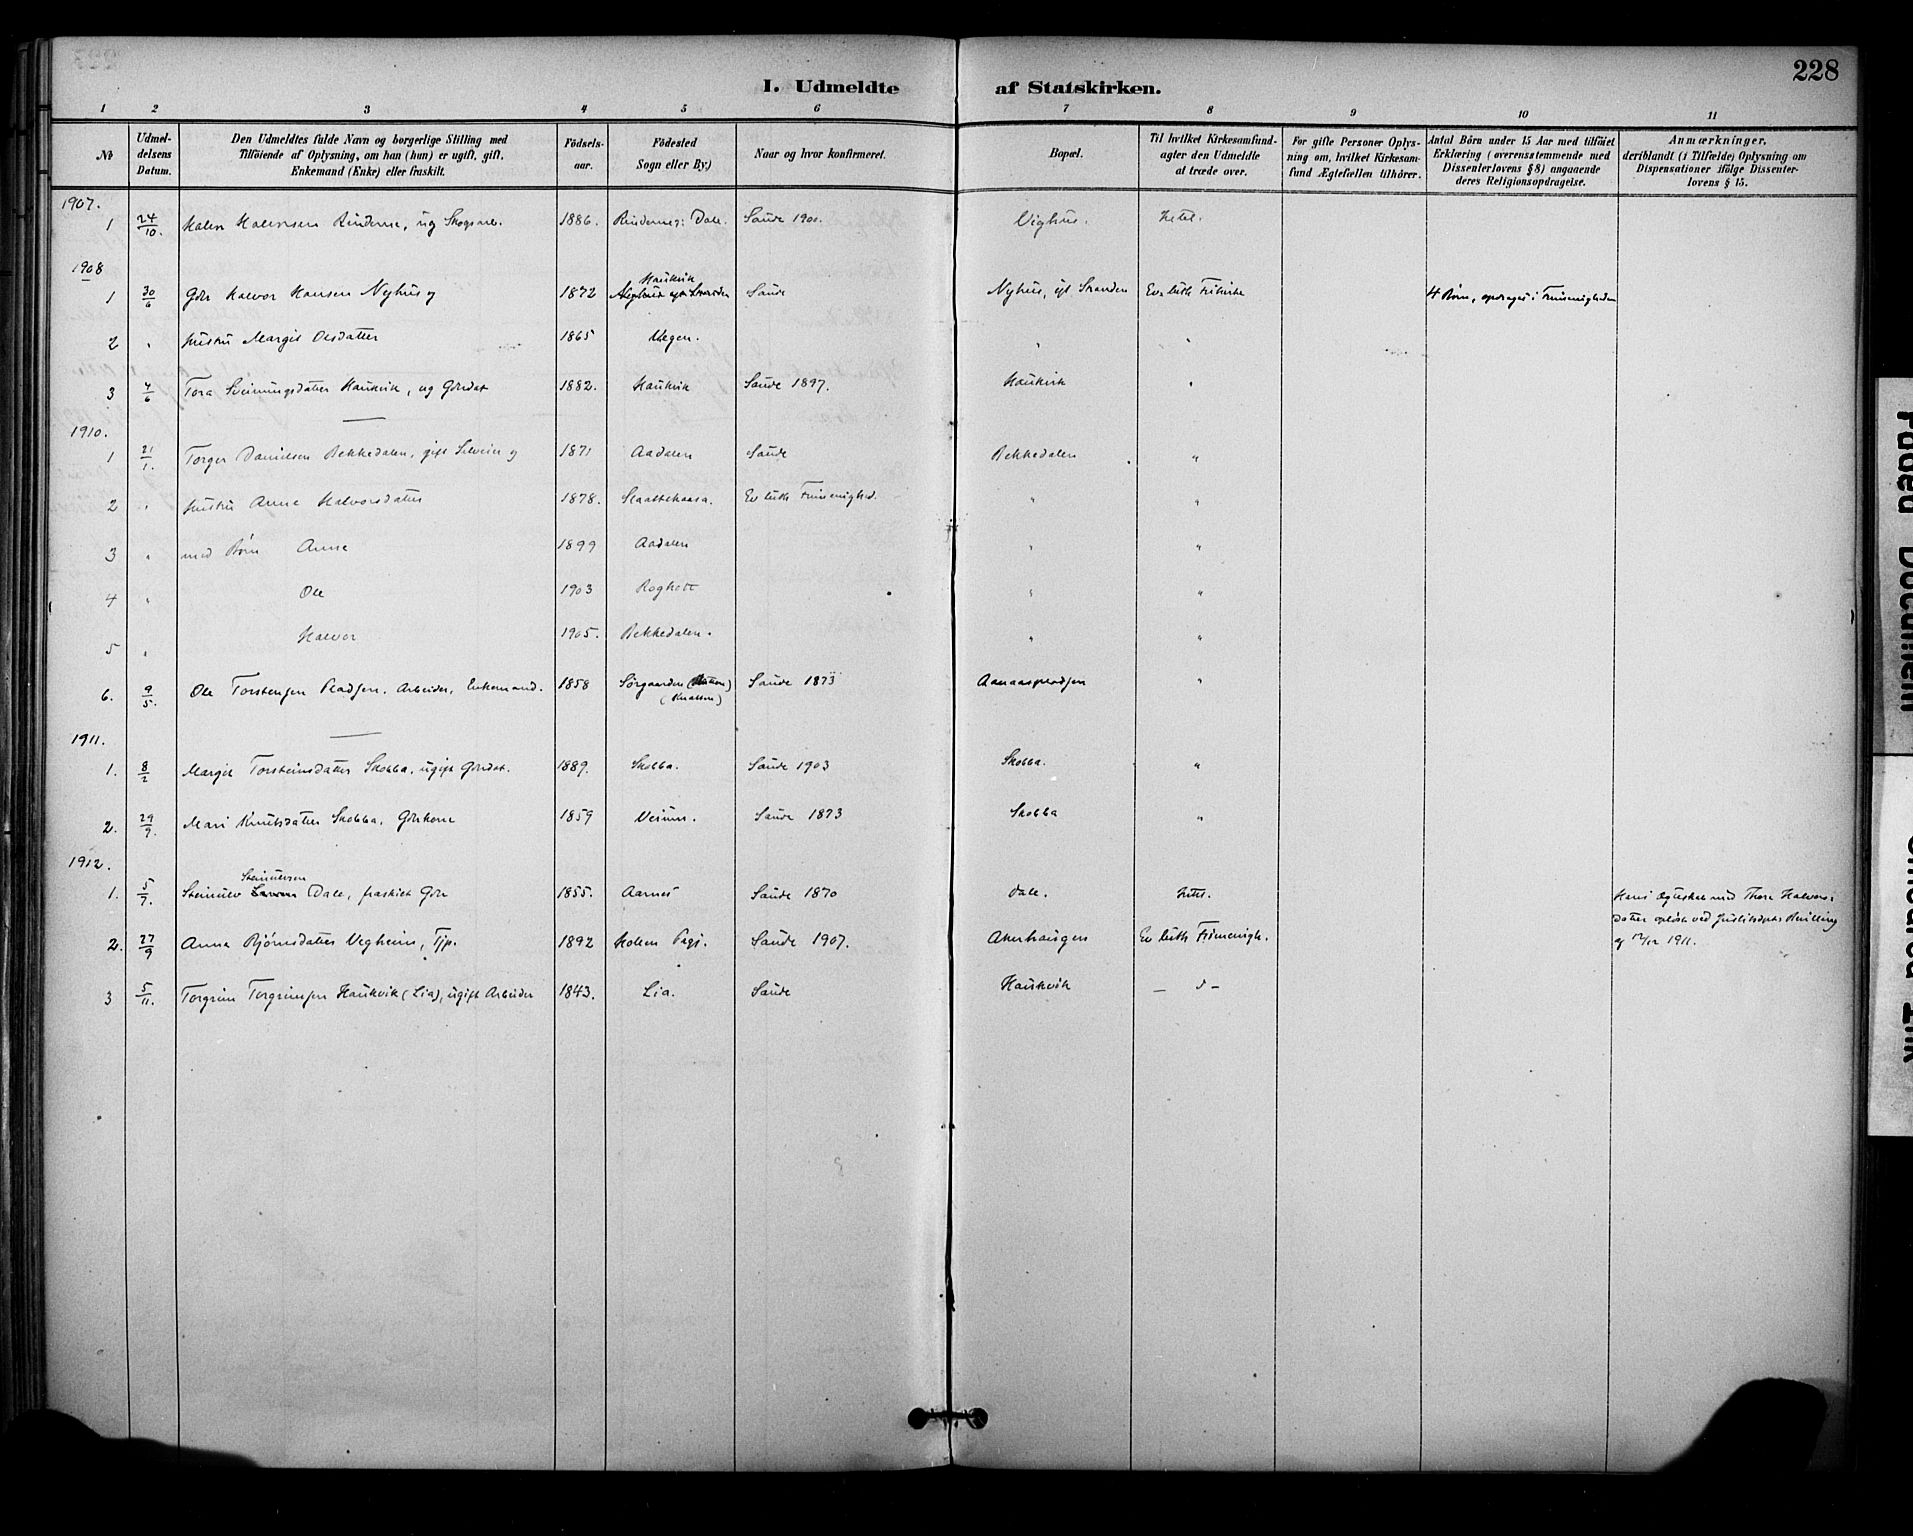 SAKO, Sauherad kirkebøker, F/Fa/L0009: Ministerialbok nr. I 9, 1887-1912, s. 228